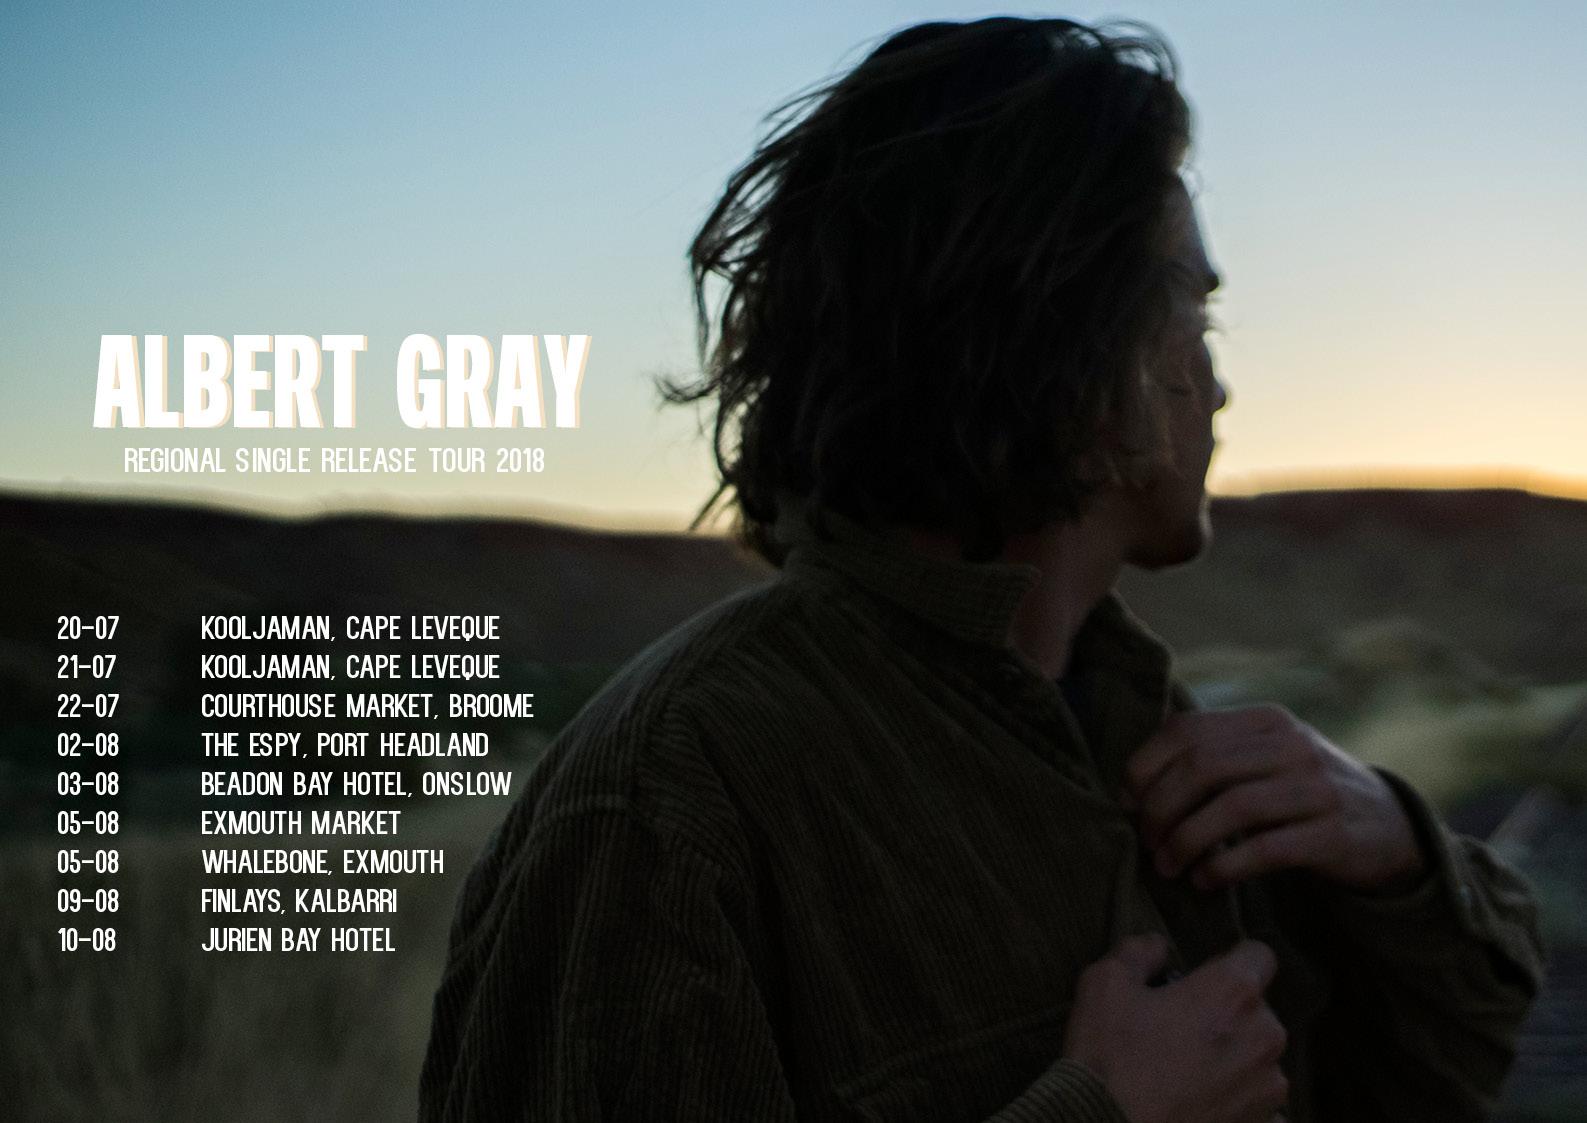 poster-nw-2018-Albertgray-website.jpg